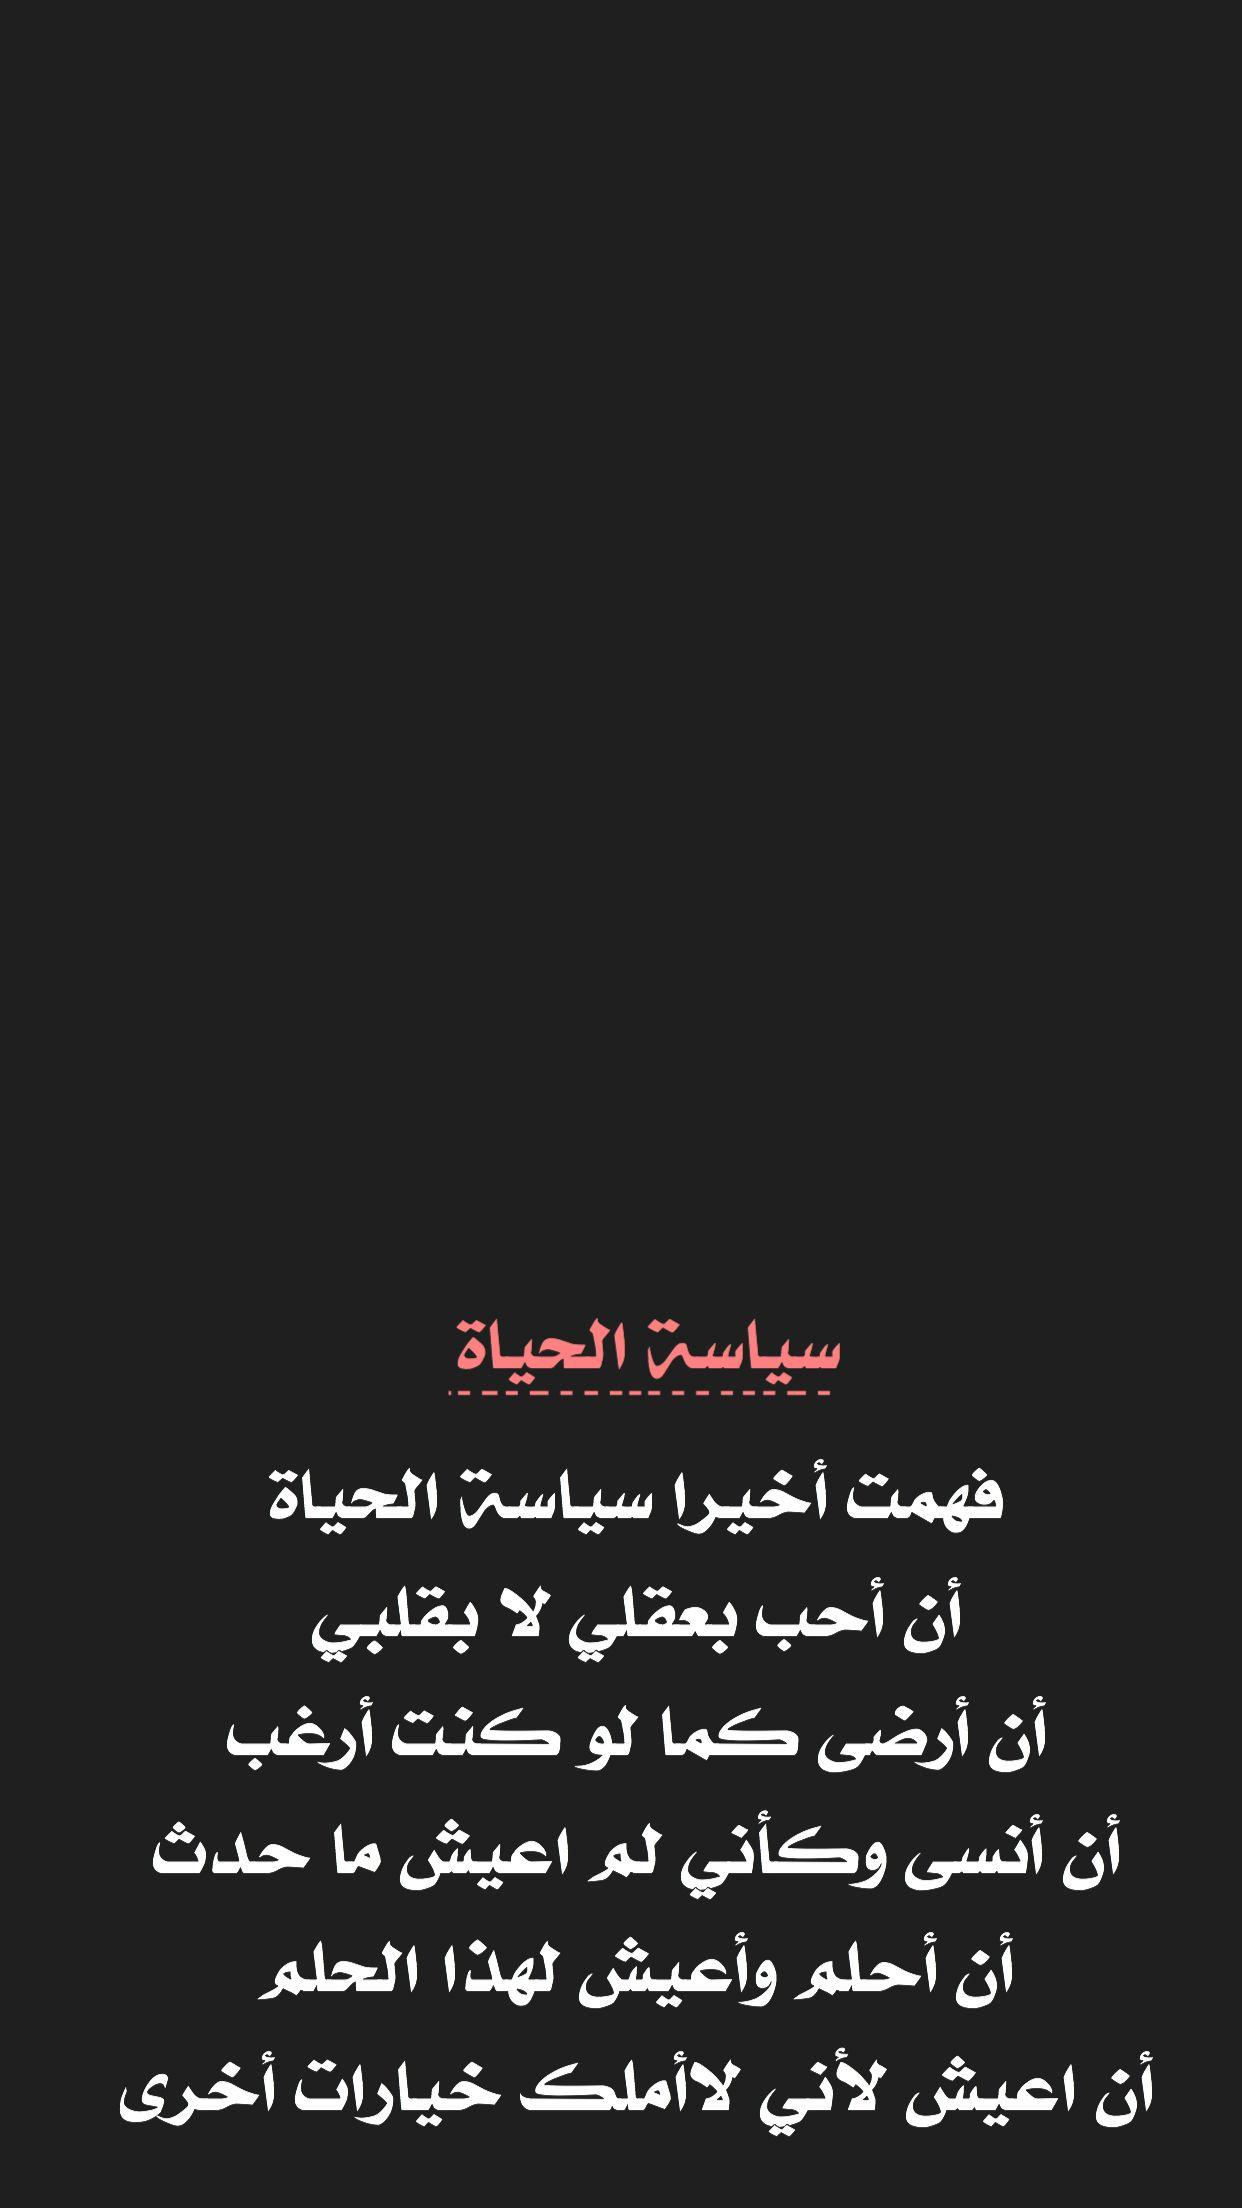 Pin By موضي البليهد On سناب موضي البليهد Reading Arabic Arabic Calligraphy